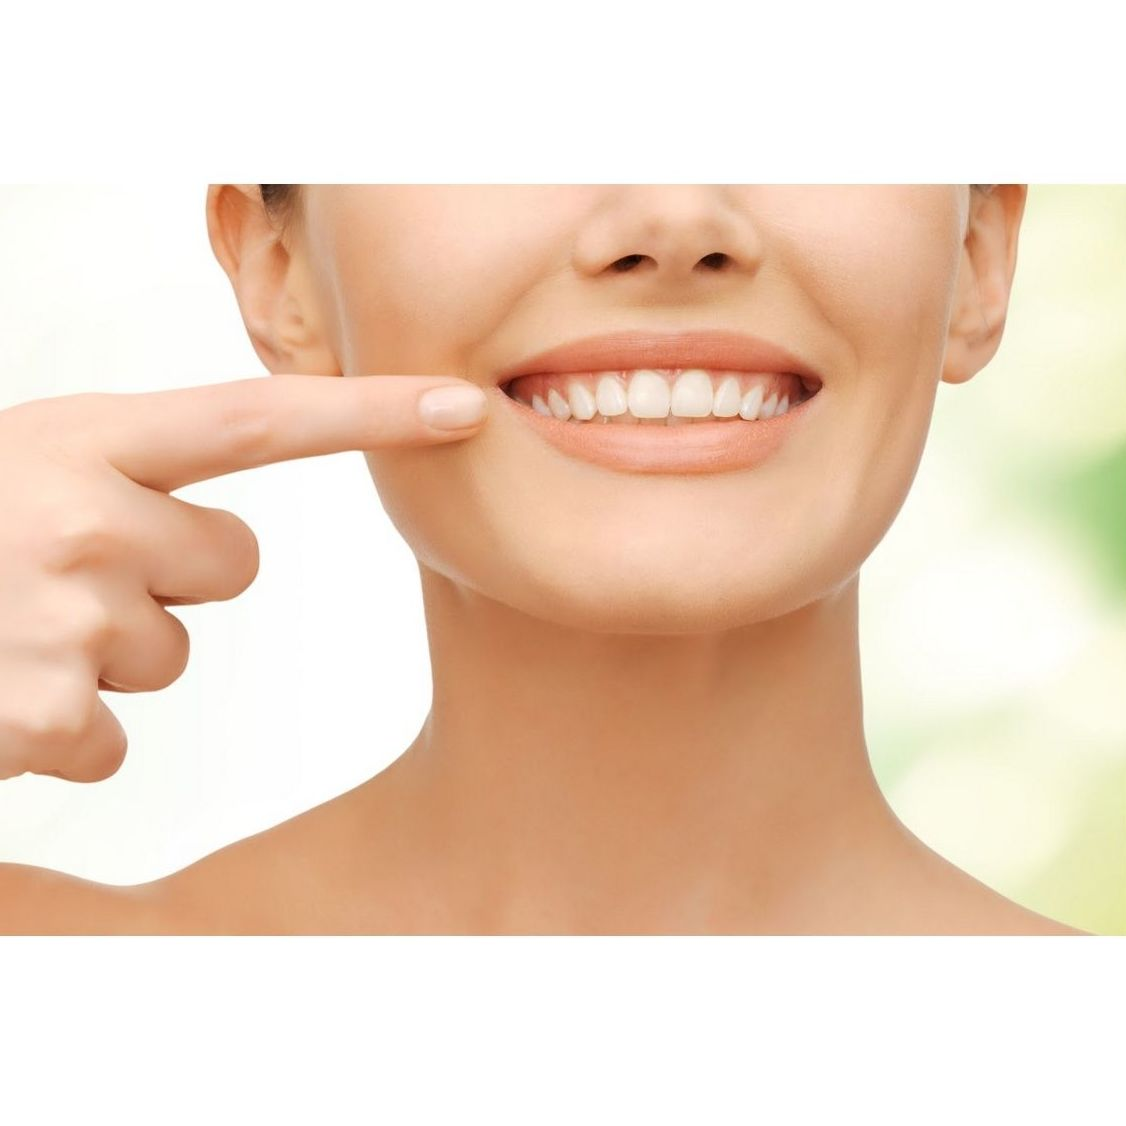 Servicios de área de odontología: TRATAMIENTOS de C.E.O. Dras. Travesí